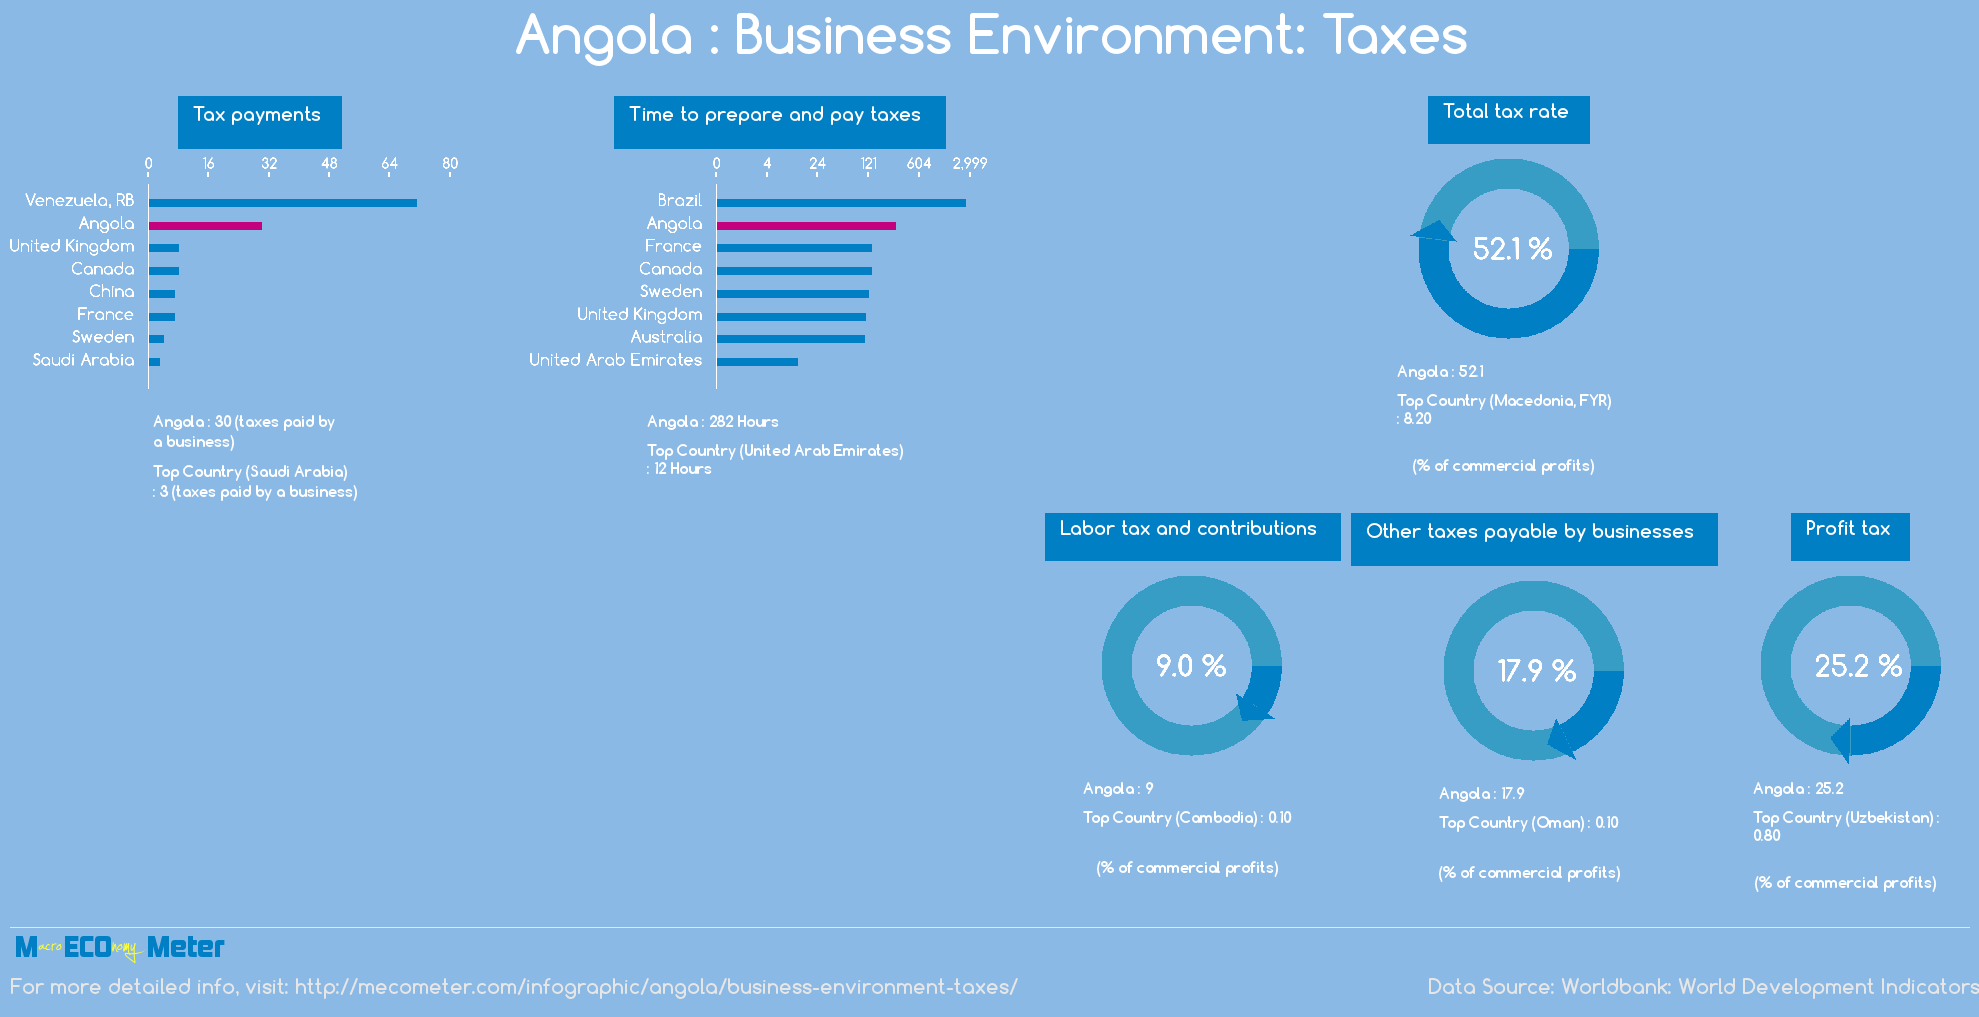 Angola : Business Environment: Taxes